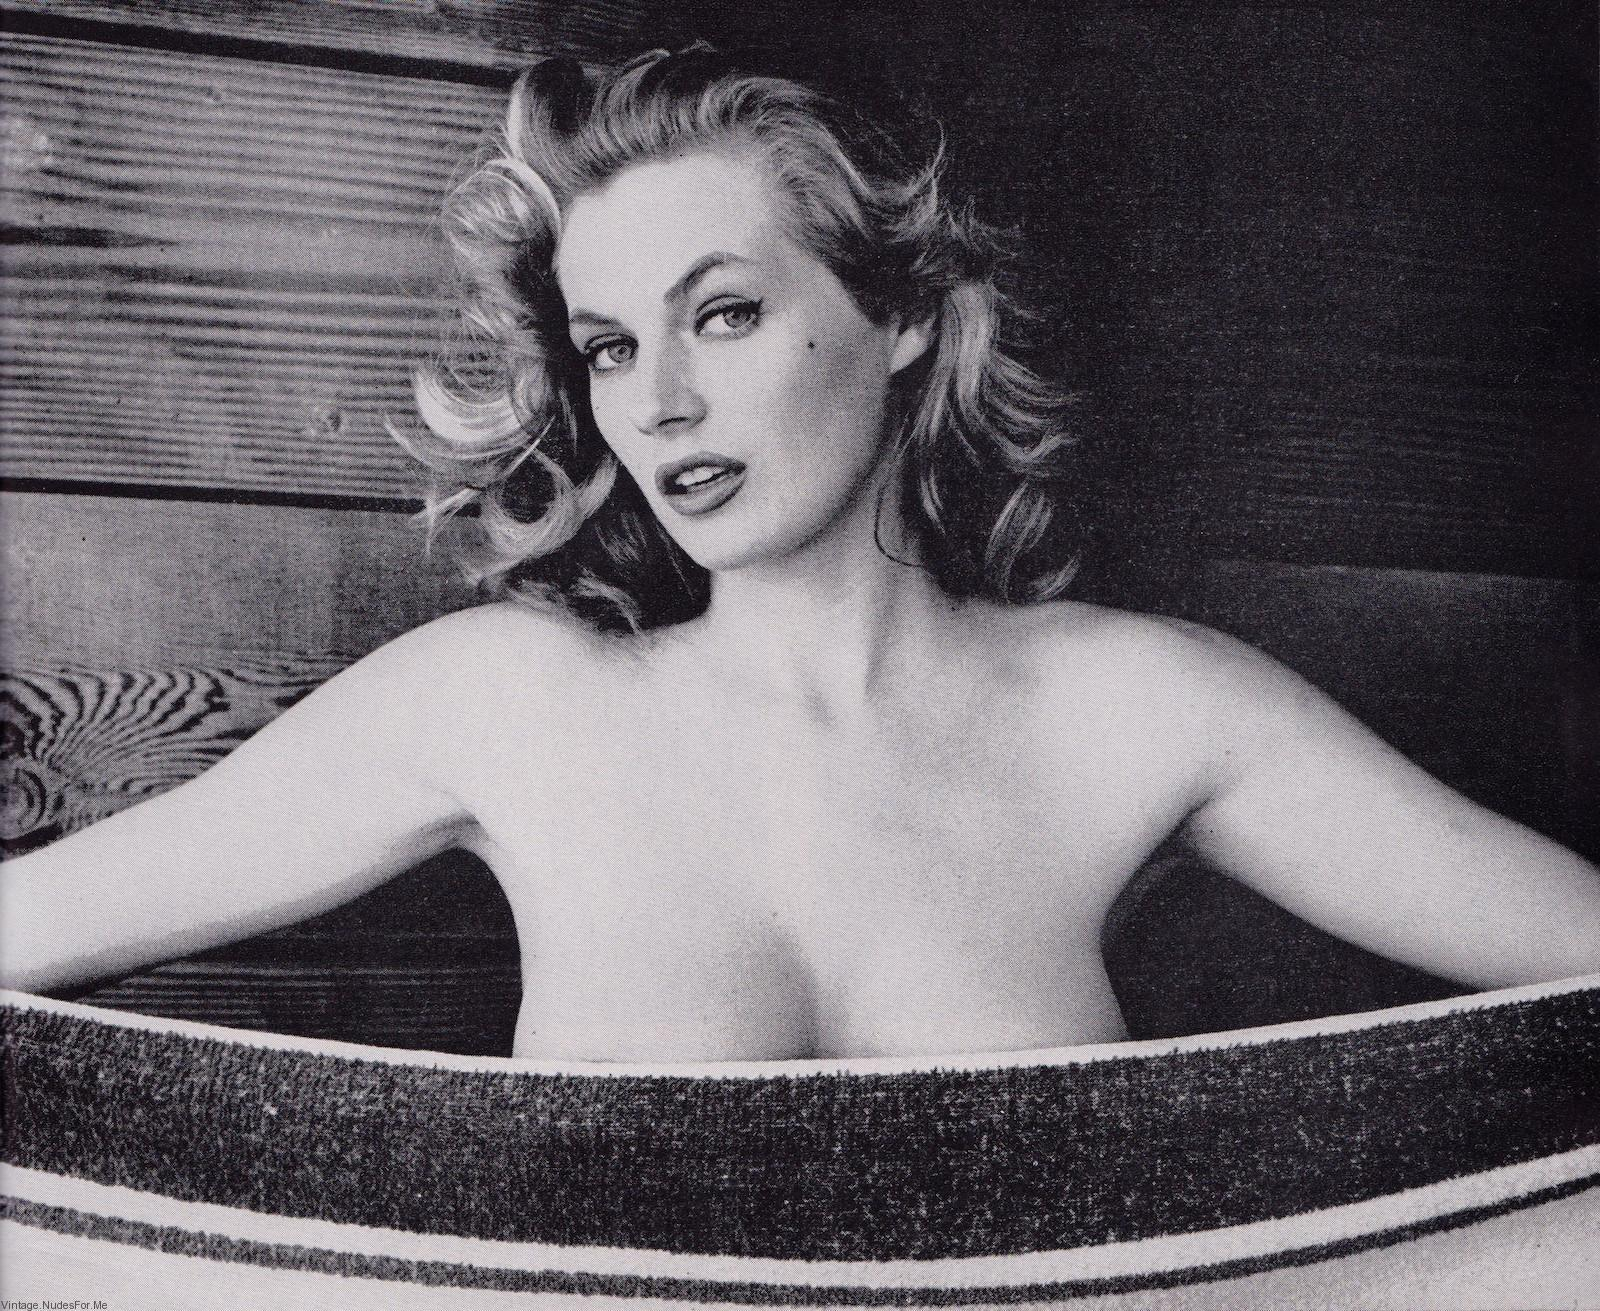 anita nude Playboy ekberg